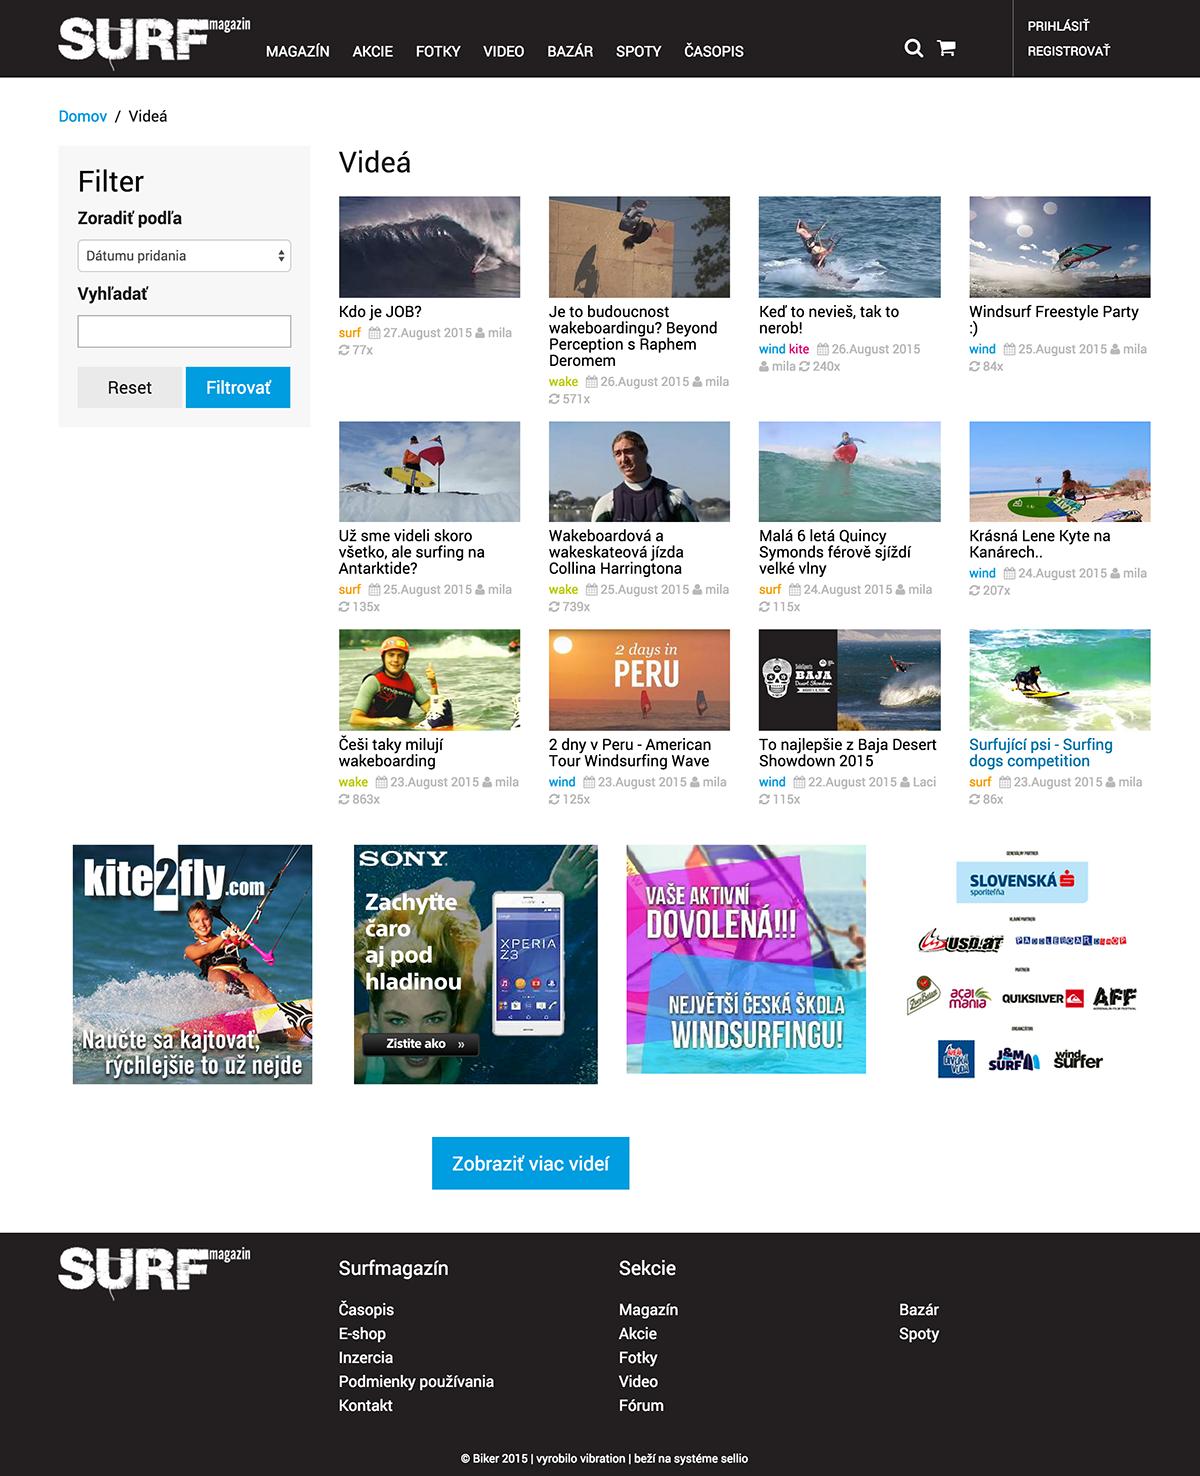 Videá surfmagazin